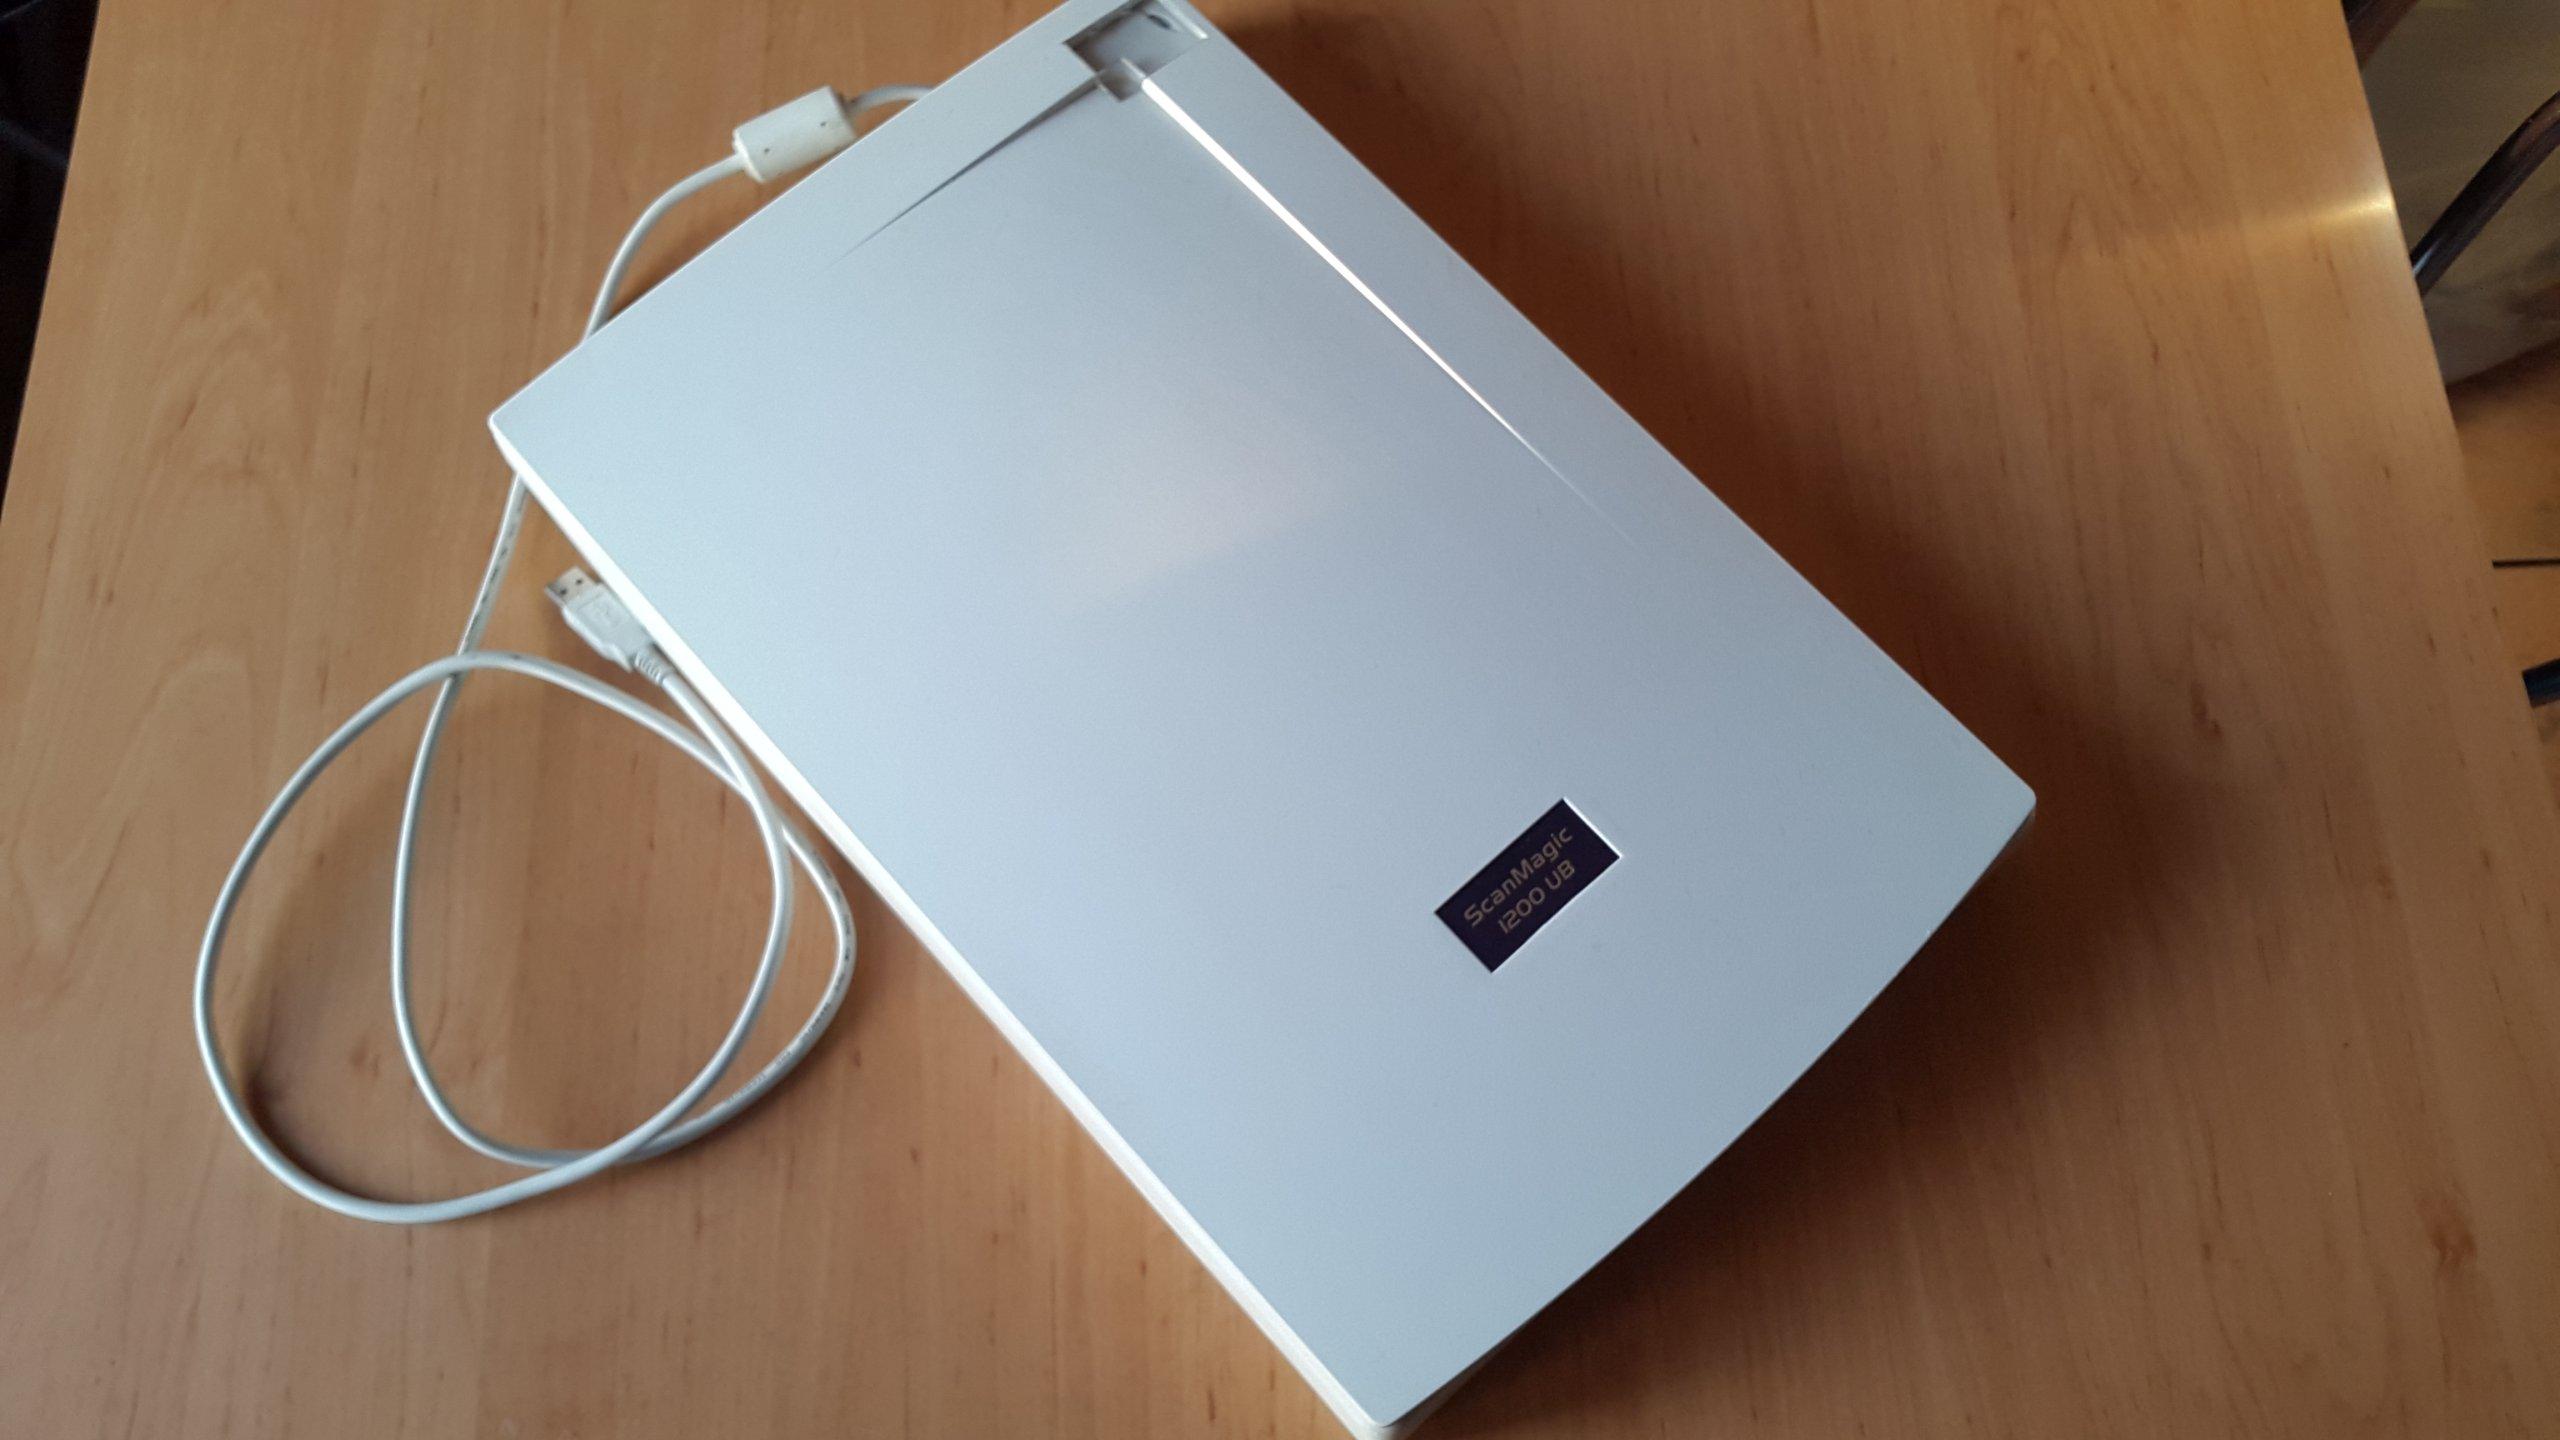 SCANMAGIC 1200 USB WINDOWS 10 DRIVERS